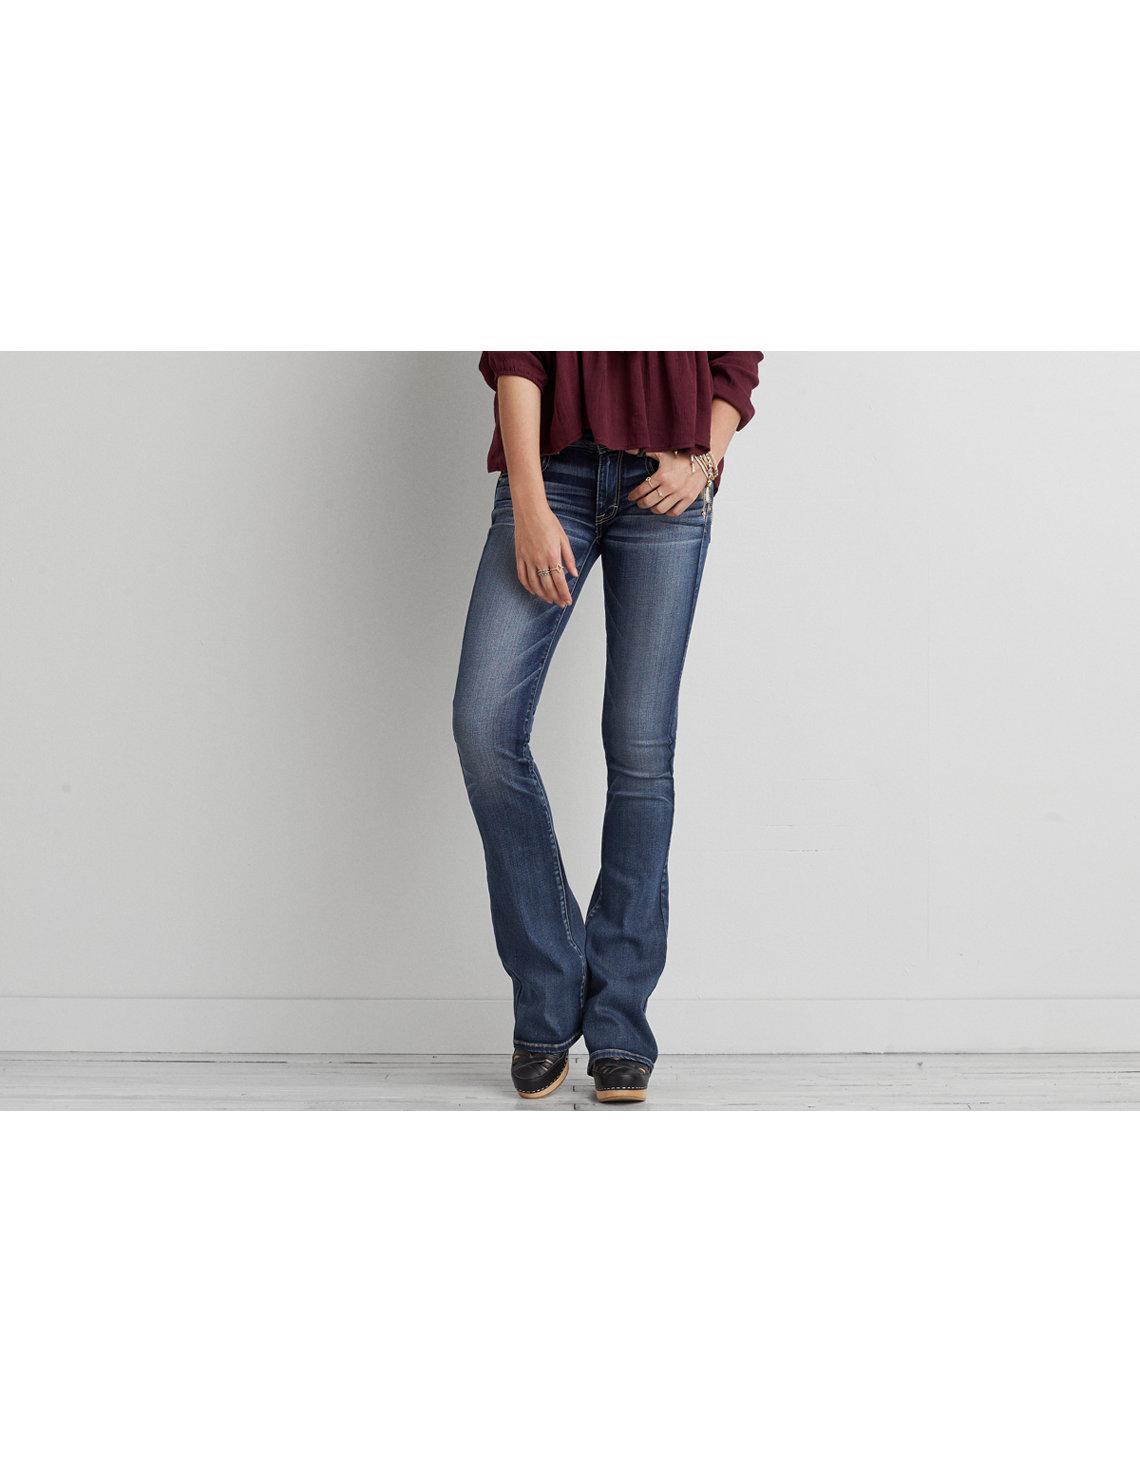 AE Denim X Kick Boot Jean - Indigo Super Skinny Jeans American Eagle Outfitters